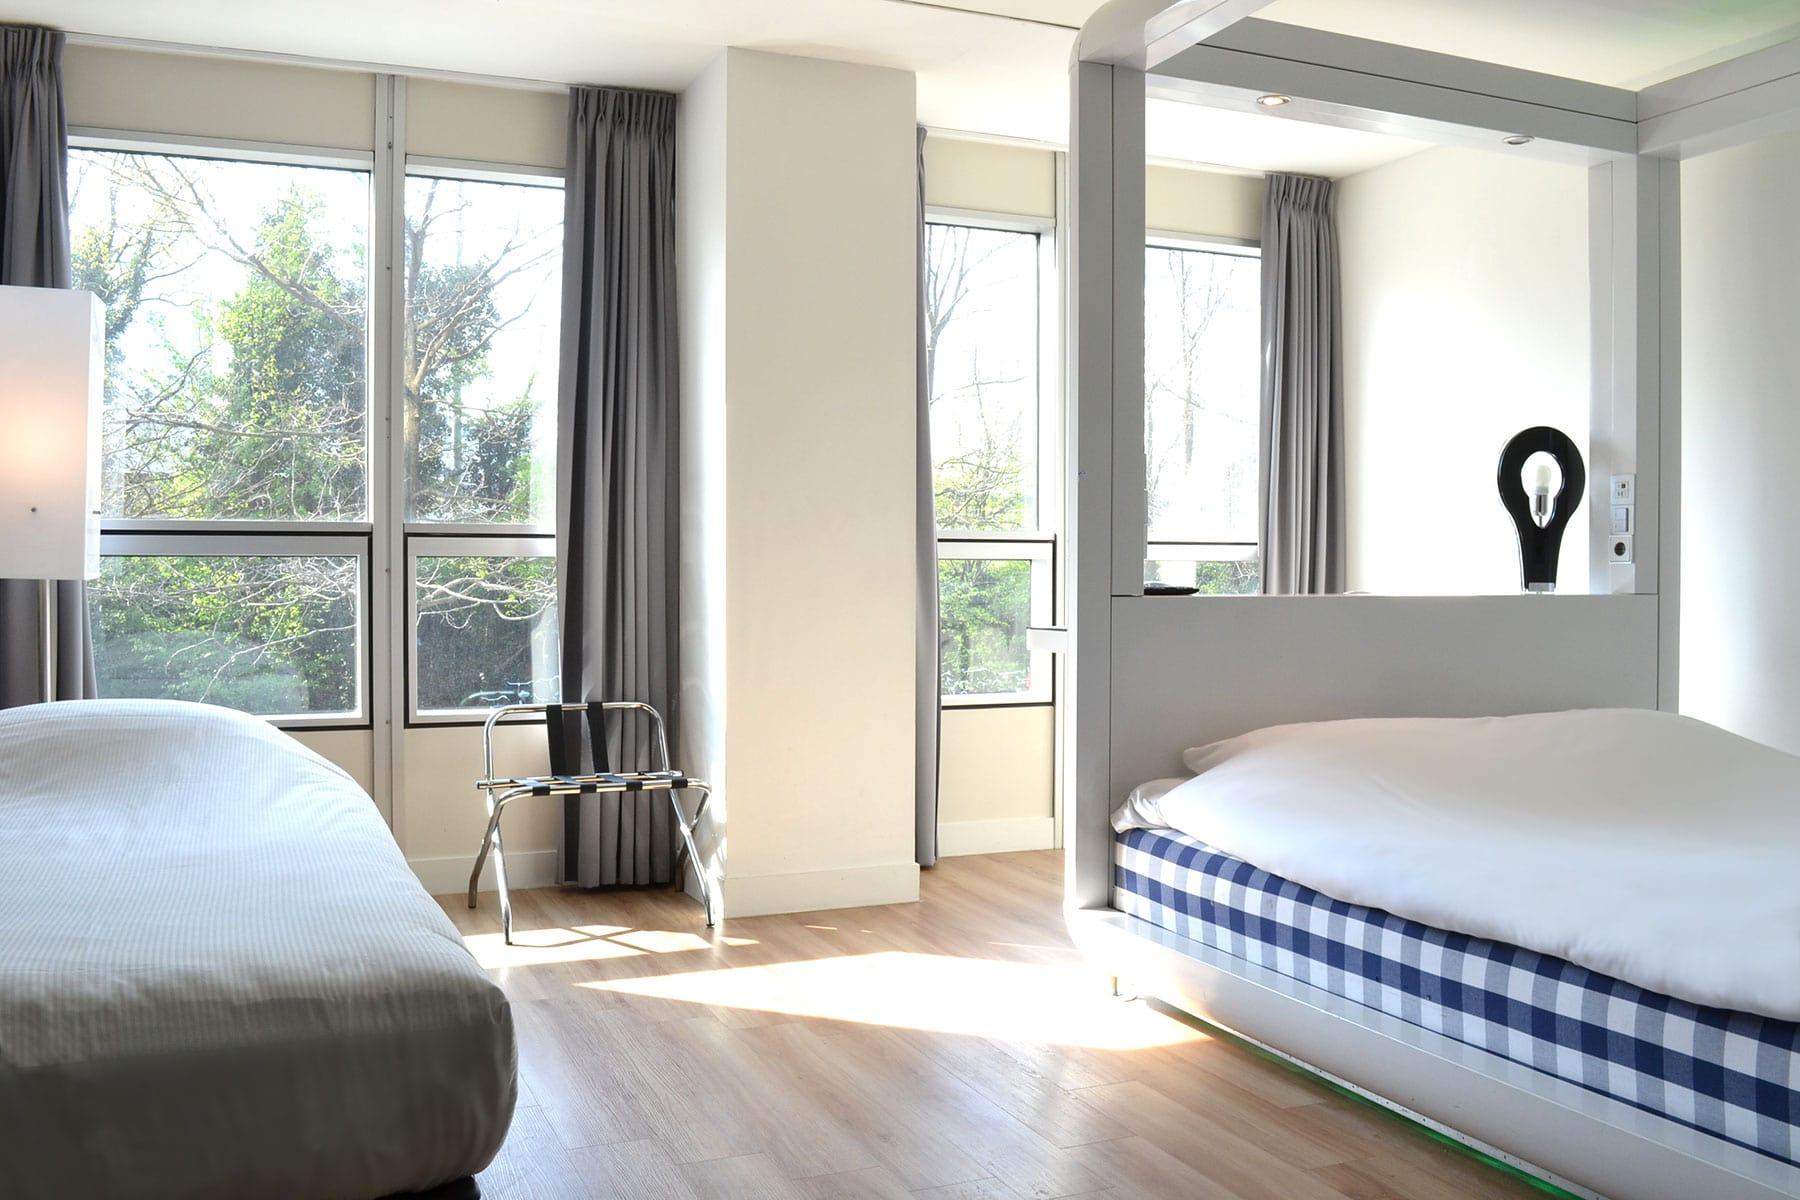 Qbic Hotel Amsterdam WTC: Cheap Design Hotel Amsterdam